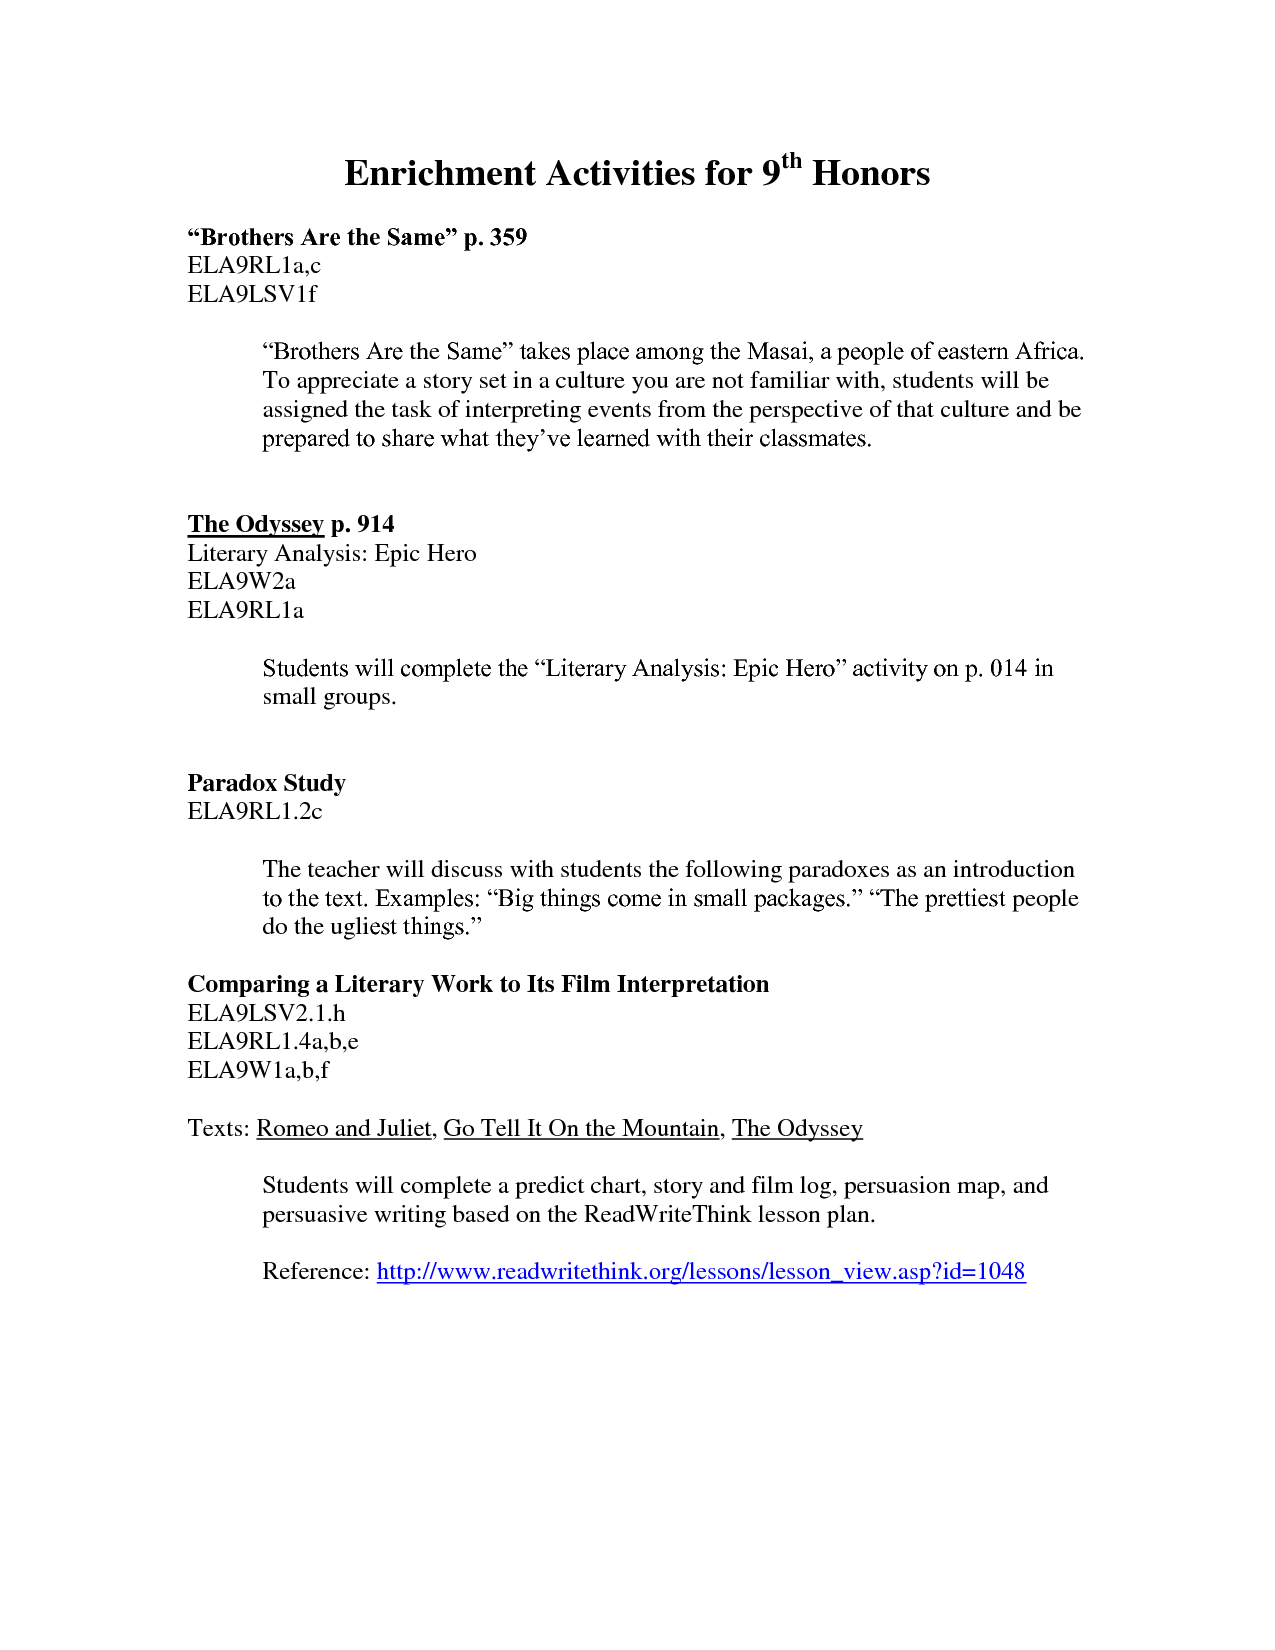 Worksheet For 5th Grade Language Arts